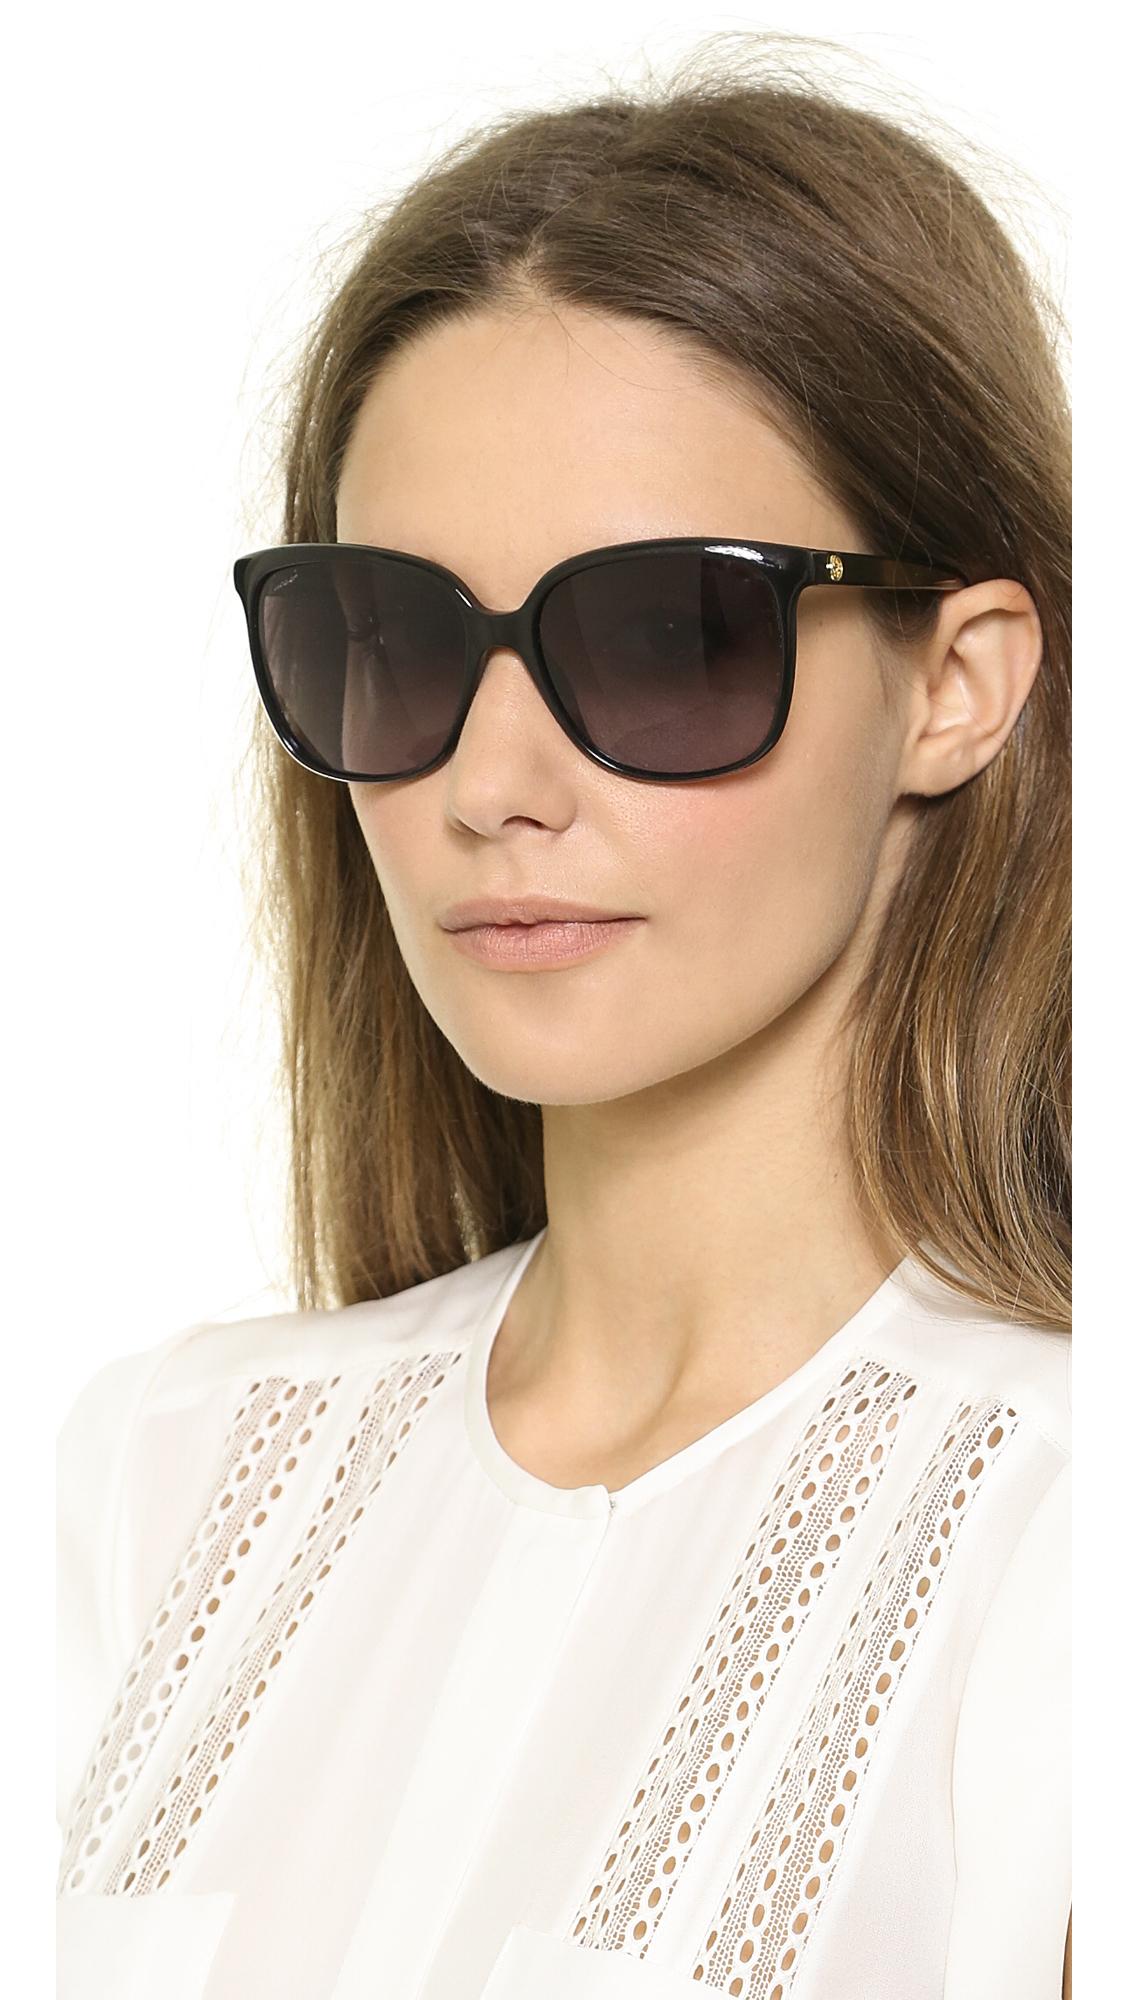 Gucci Square Gradient Sunglasses Violet Brown Gradient